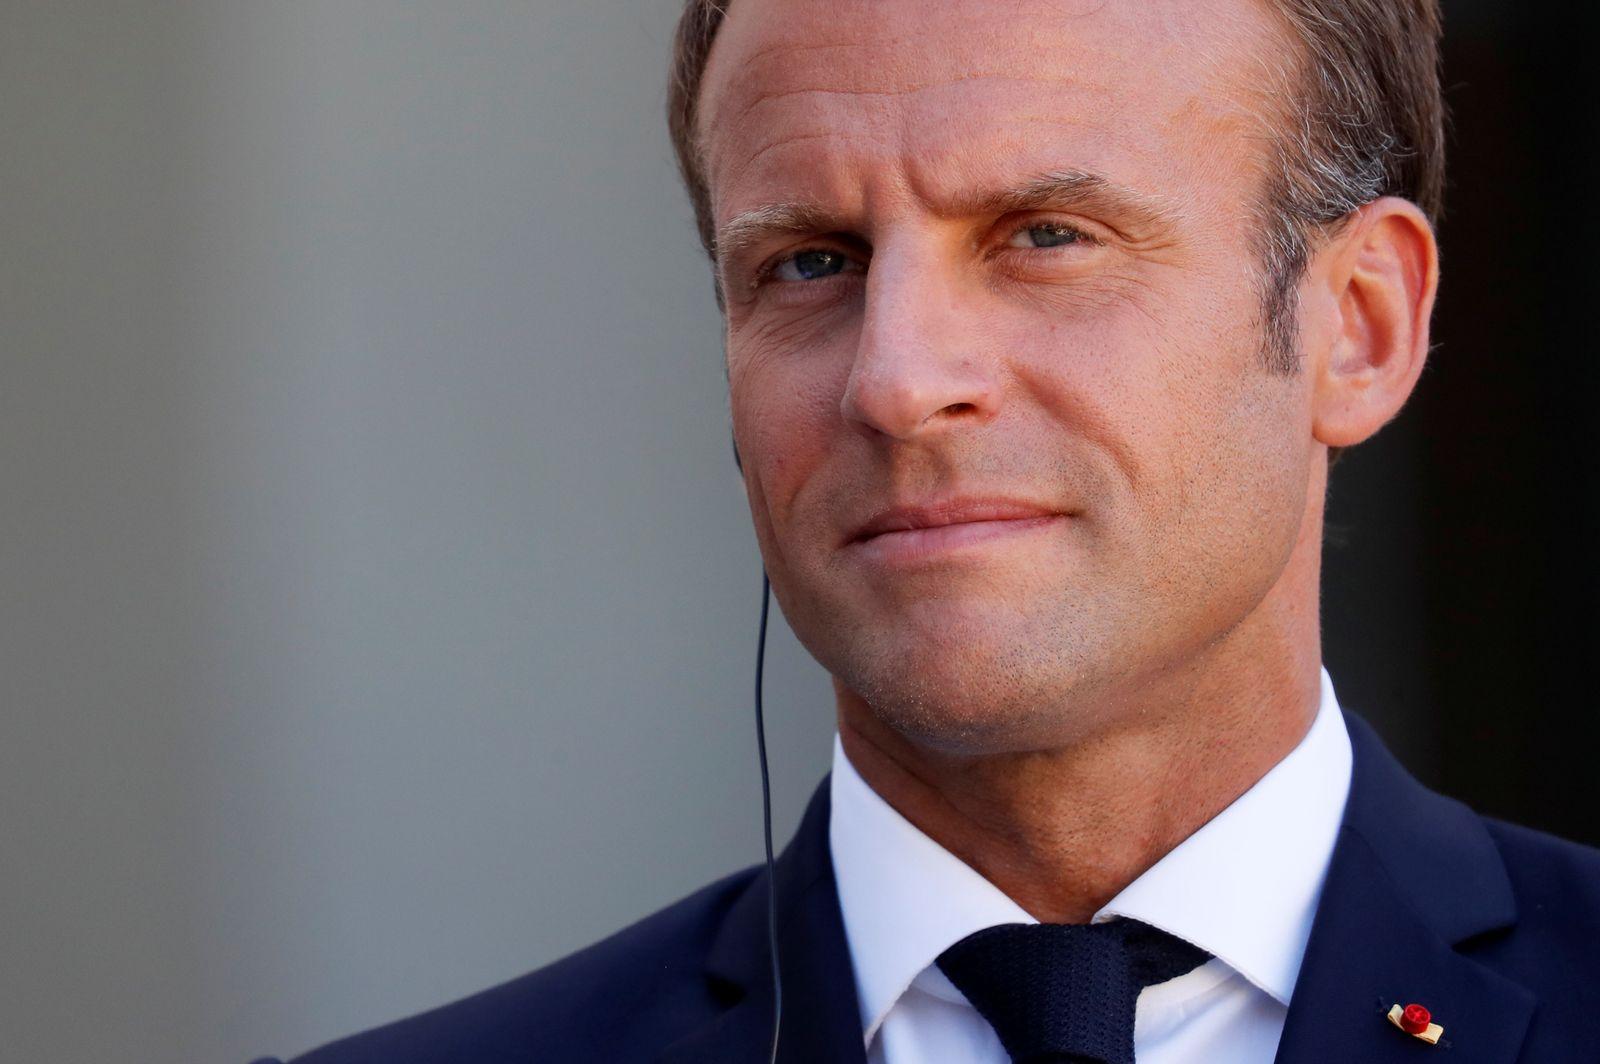 Emmanueal Macron